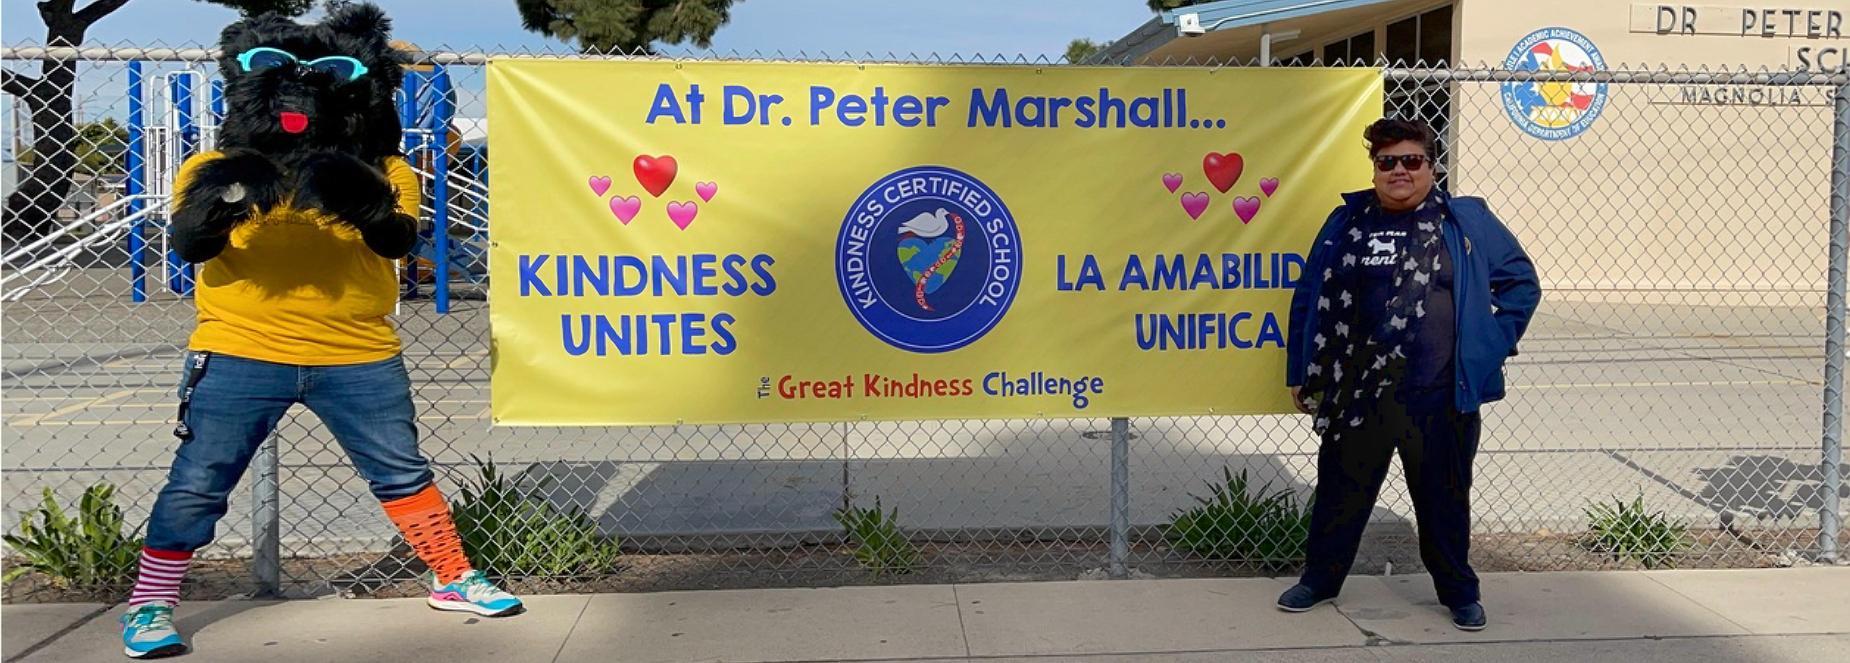 Marshall Kindness Banner